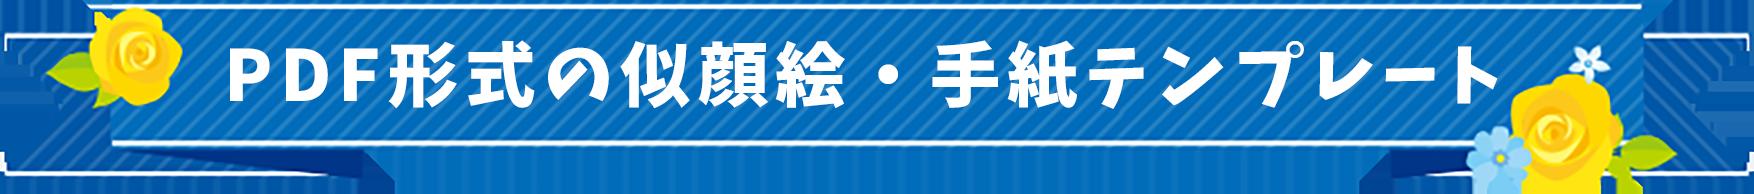 PDF形式の似顔絵・手紙テンプレート